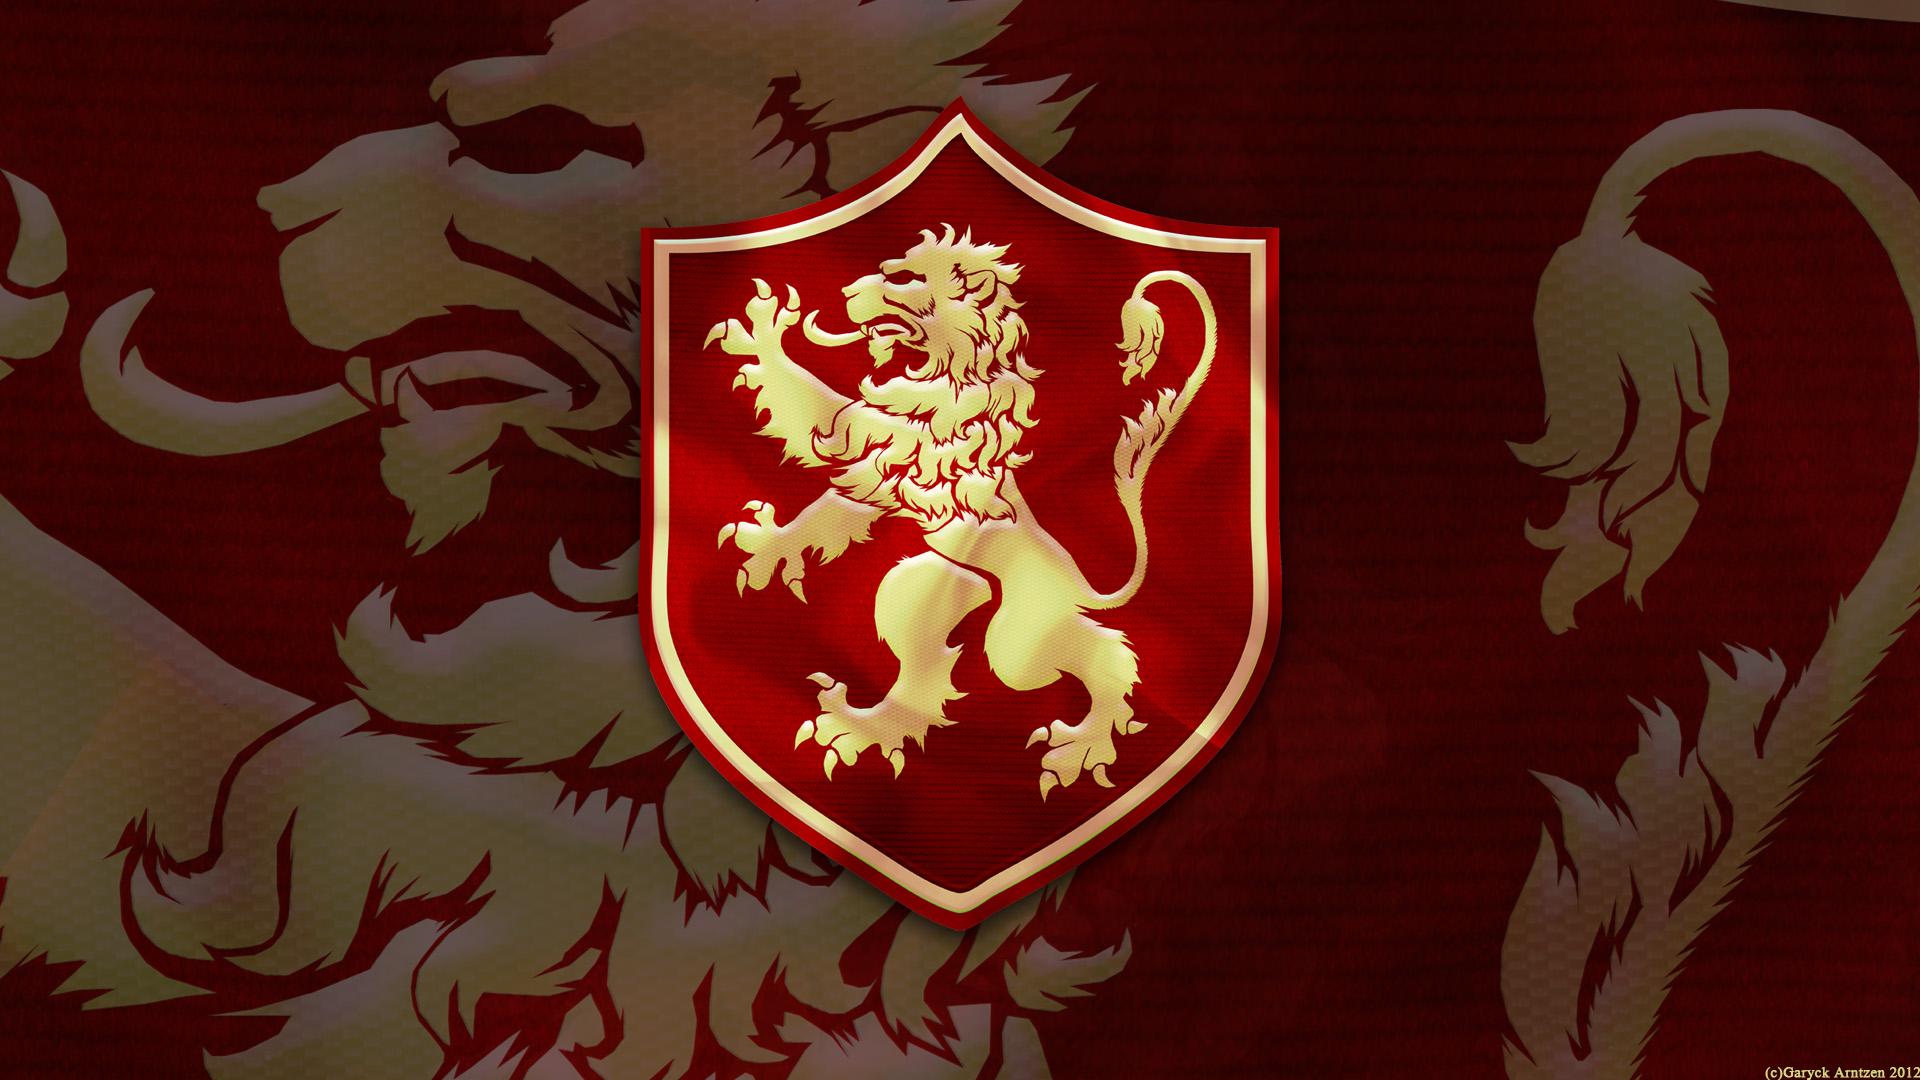 House Lannister Sigil Wallpaper Wallpapersafari